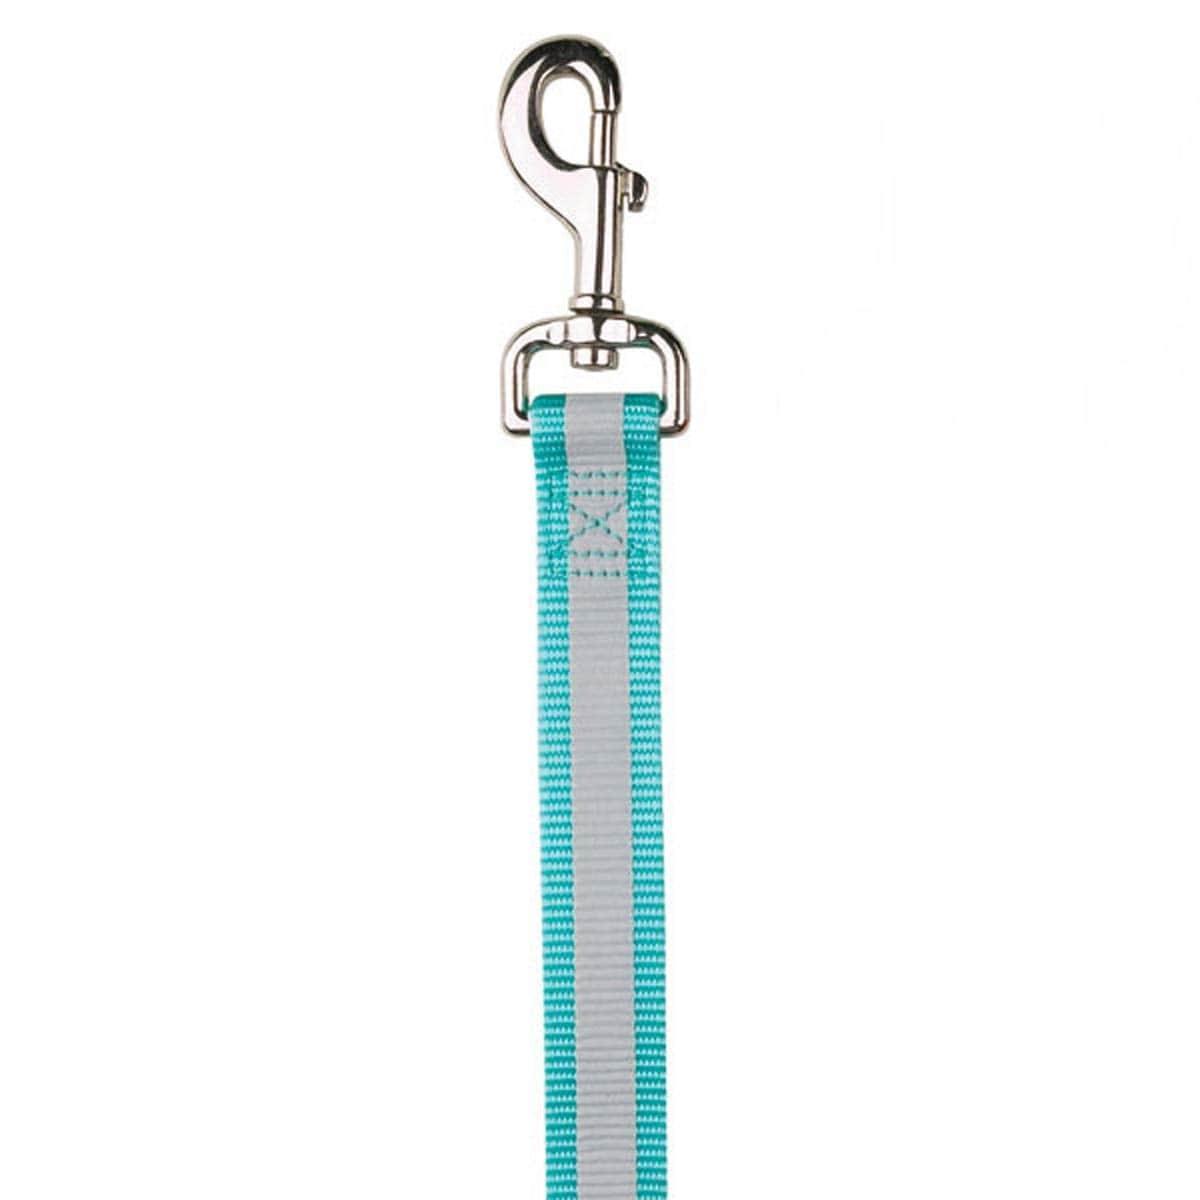 Guardian Gear Reflective Dog Leash - Mint Blue (Mint Blue - 6? Length x 1 Width)